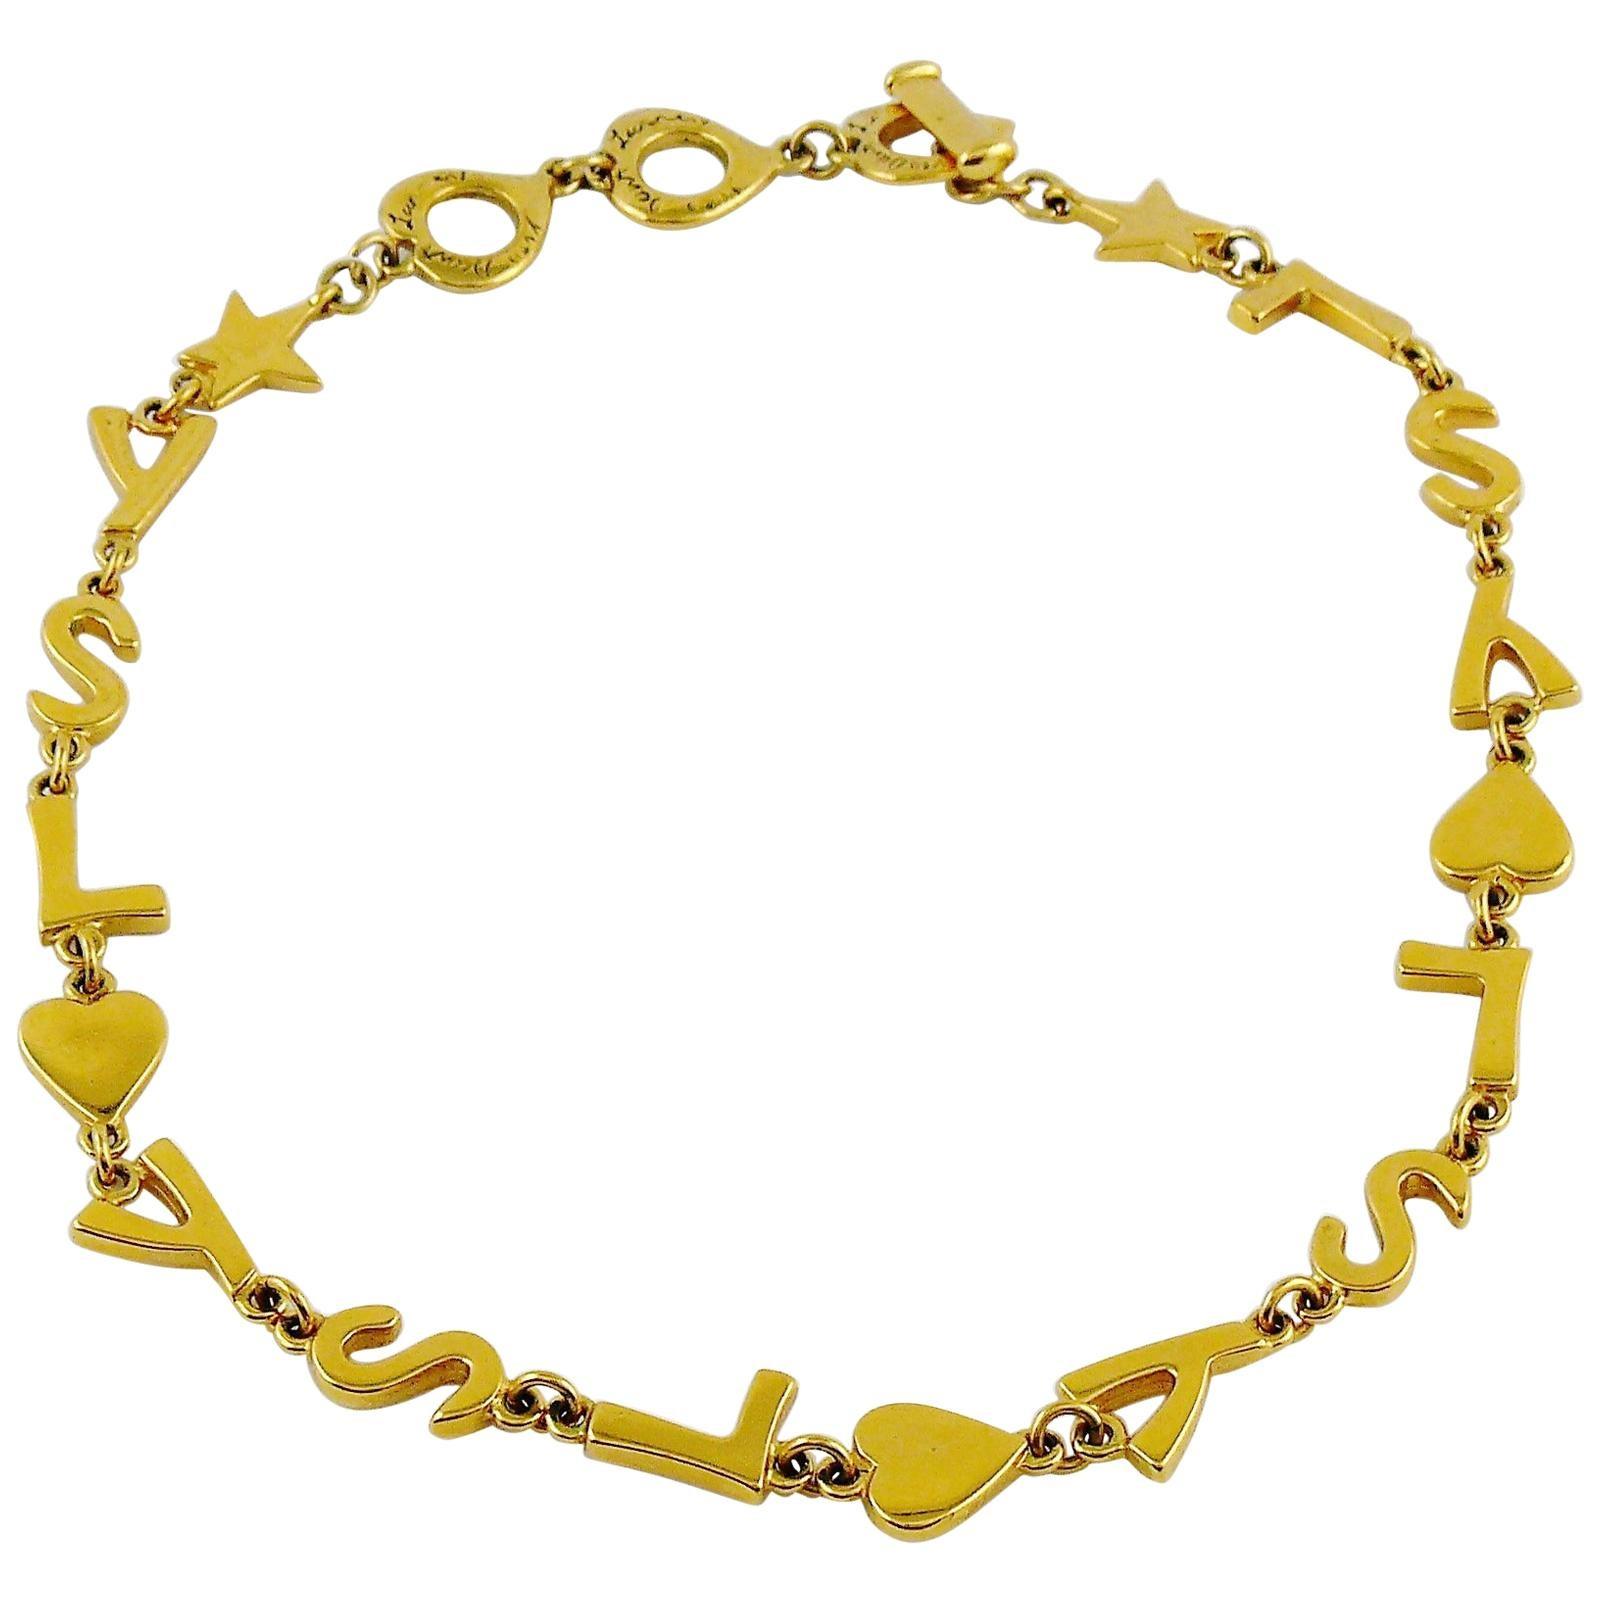 84bdc63ca31 Vintage Yves Saint Laurent Necklaces - 213 For Sale at 1stdibs